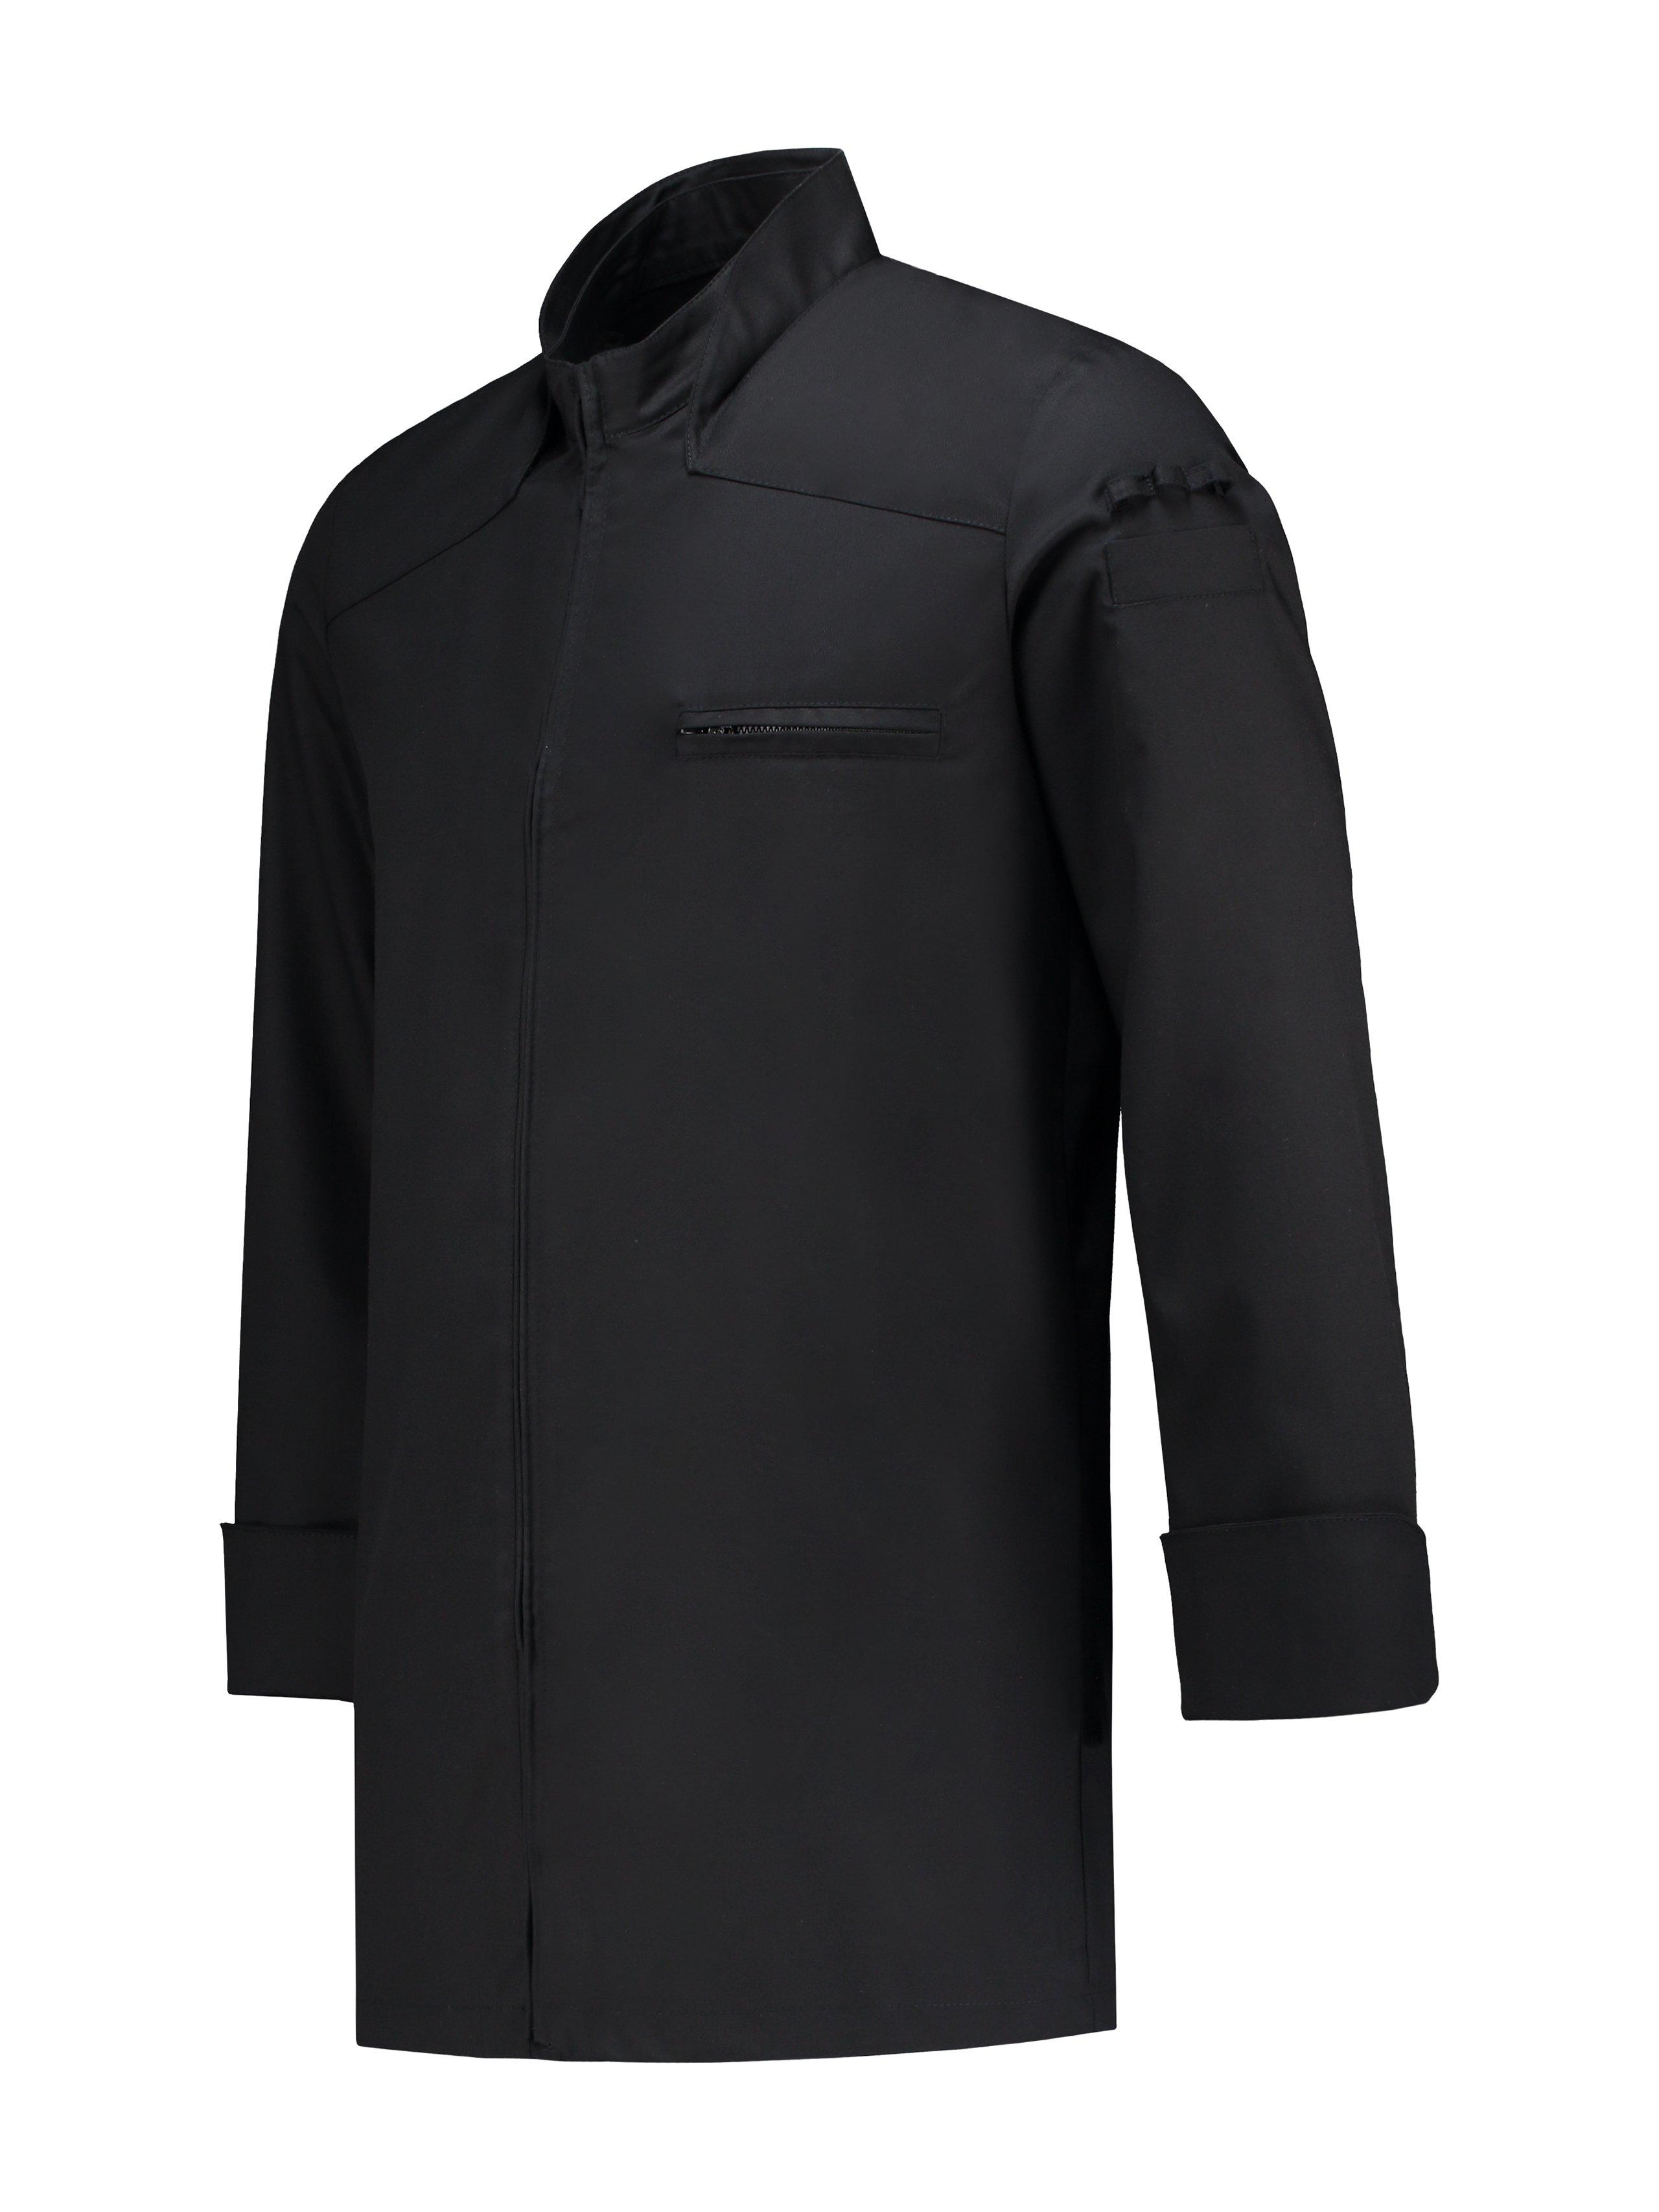 Chef Jacket Nero Black